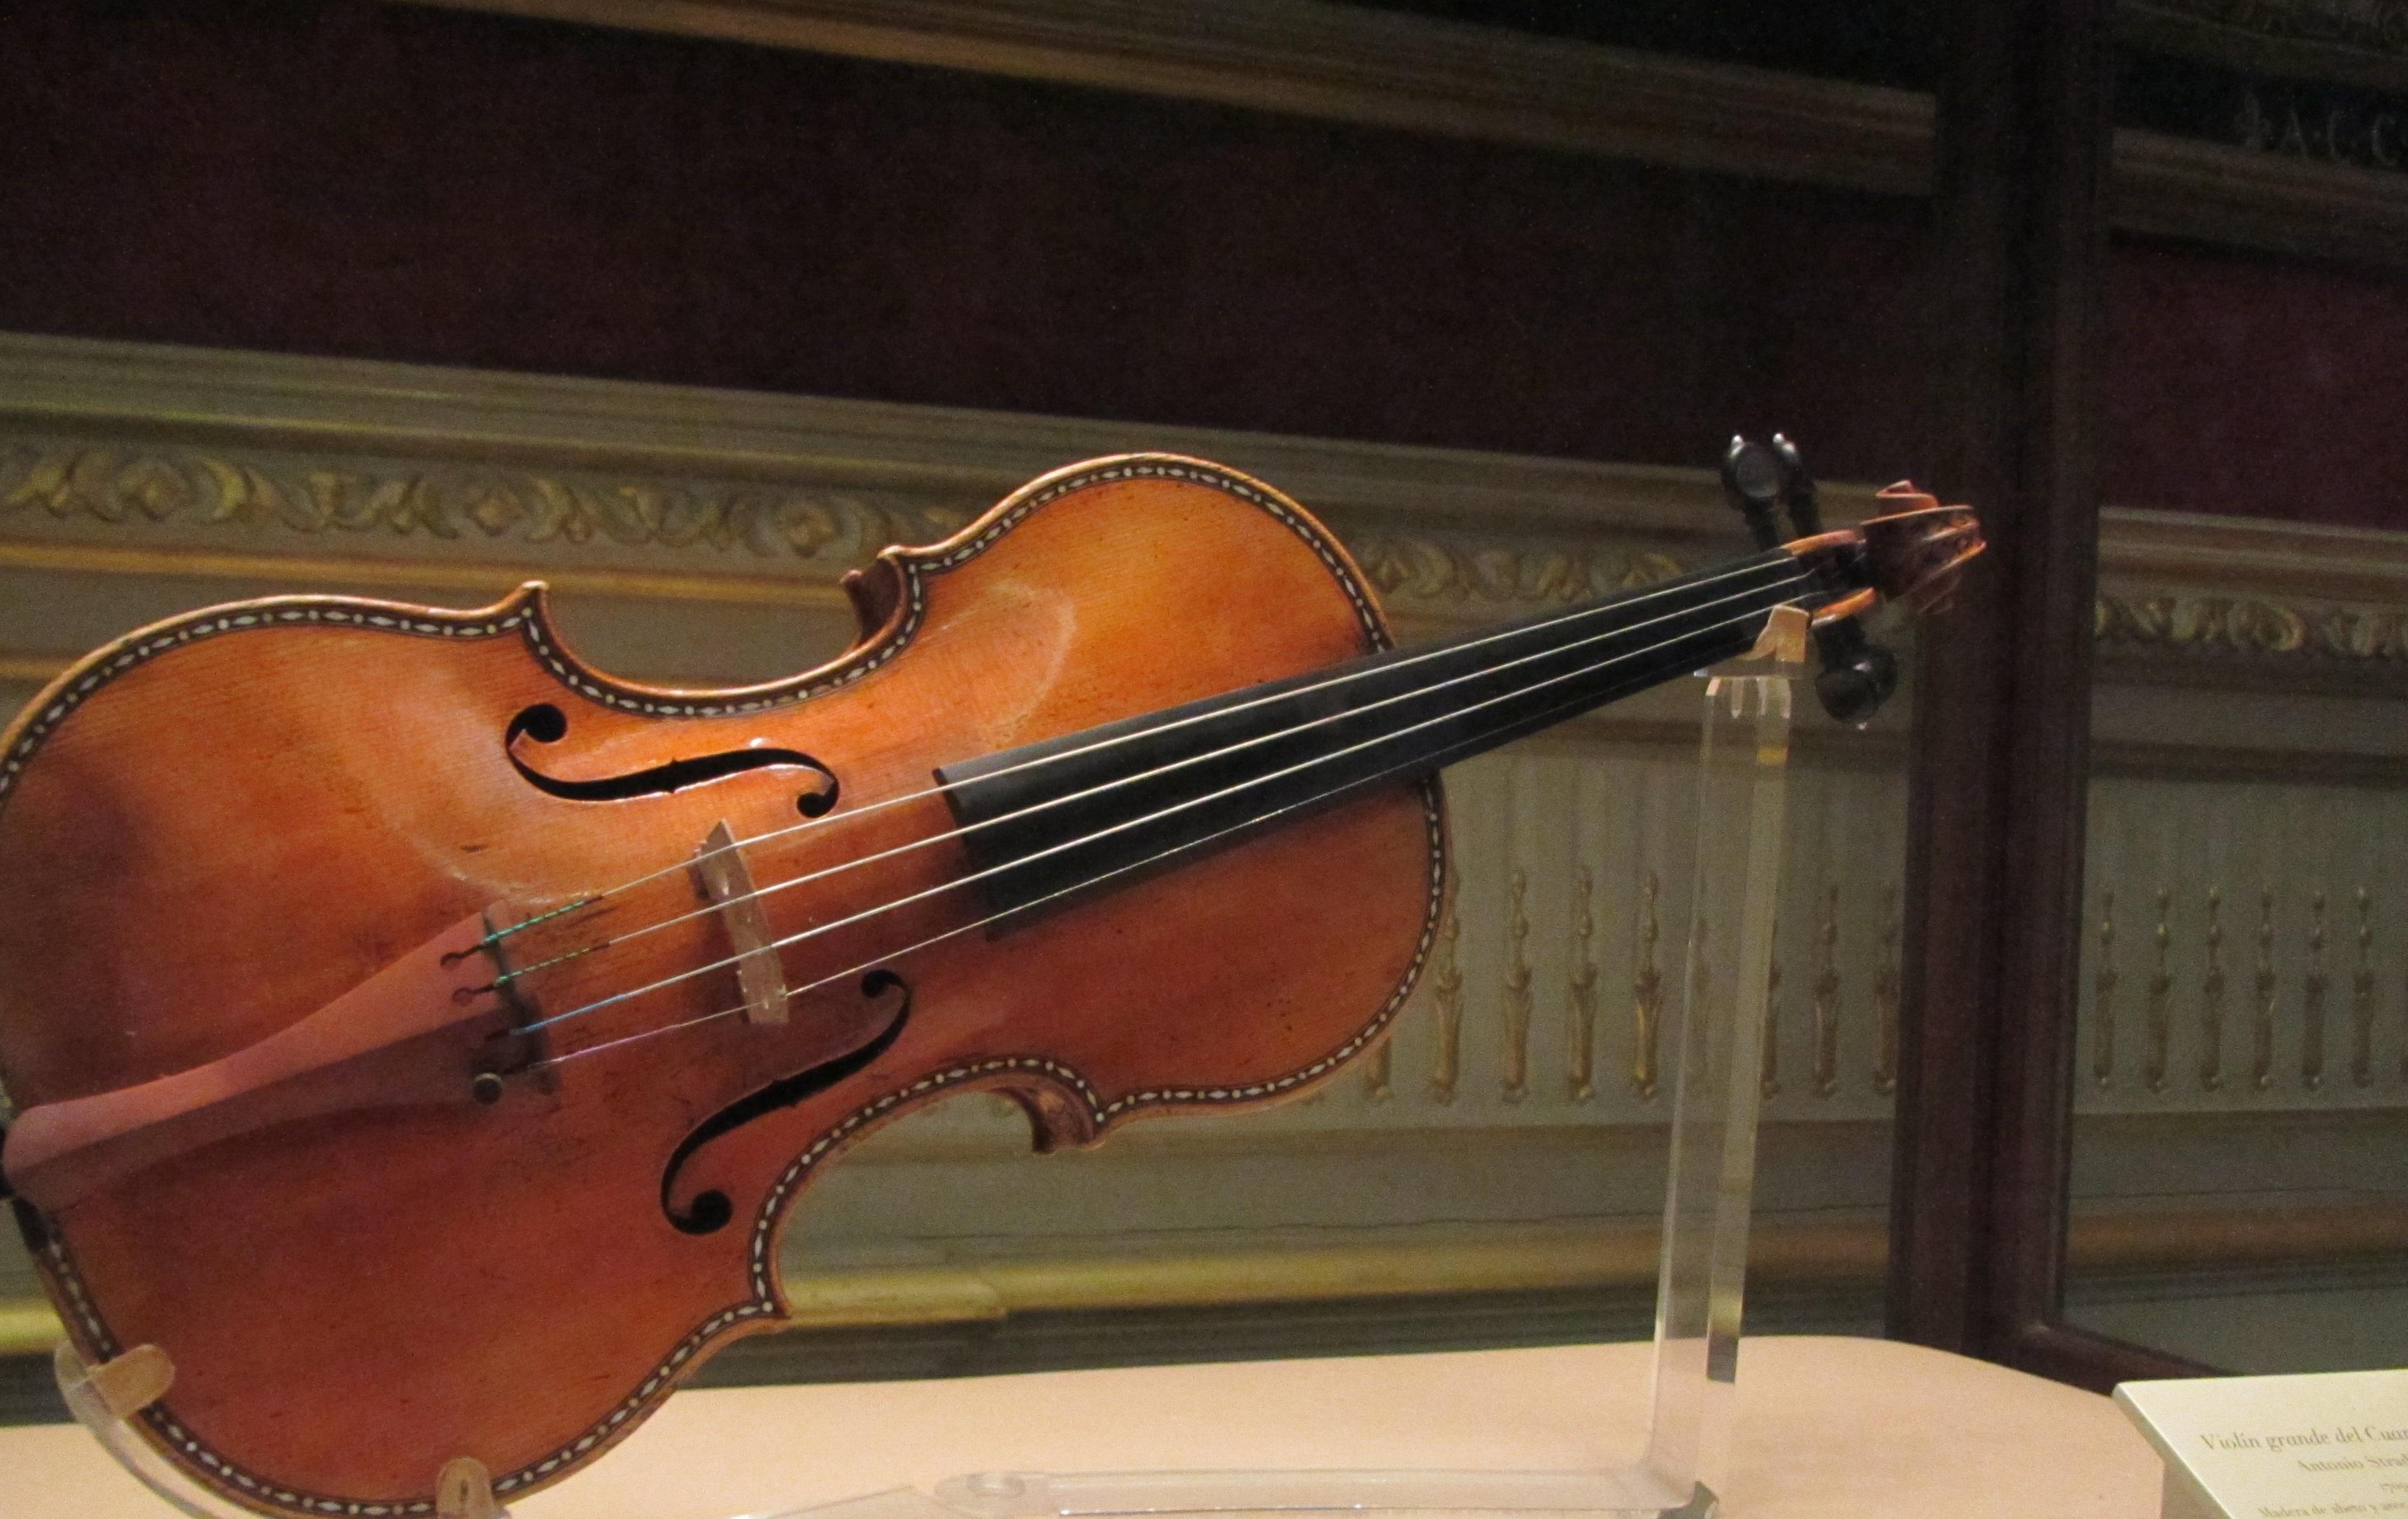 File:Stradivarius violin in the royal palace in madrid.jpg ...